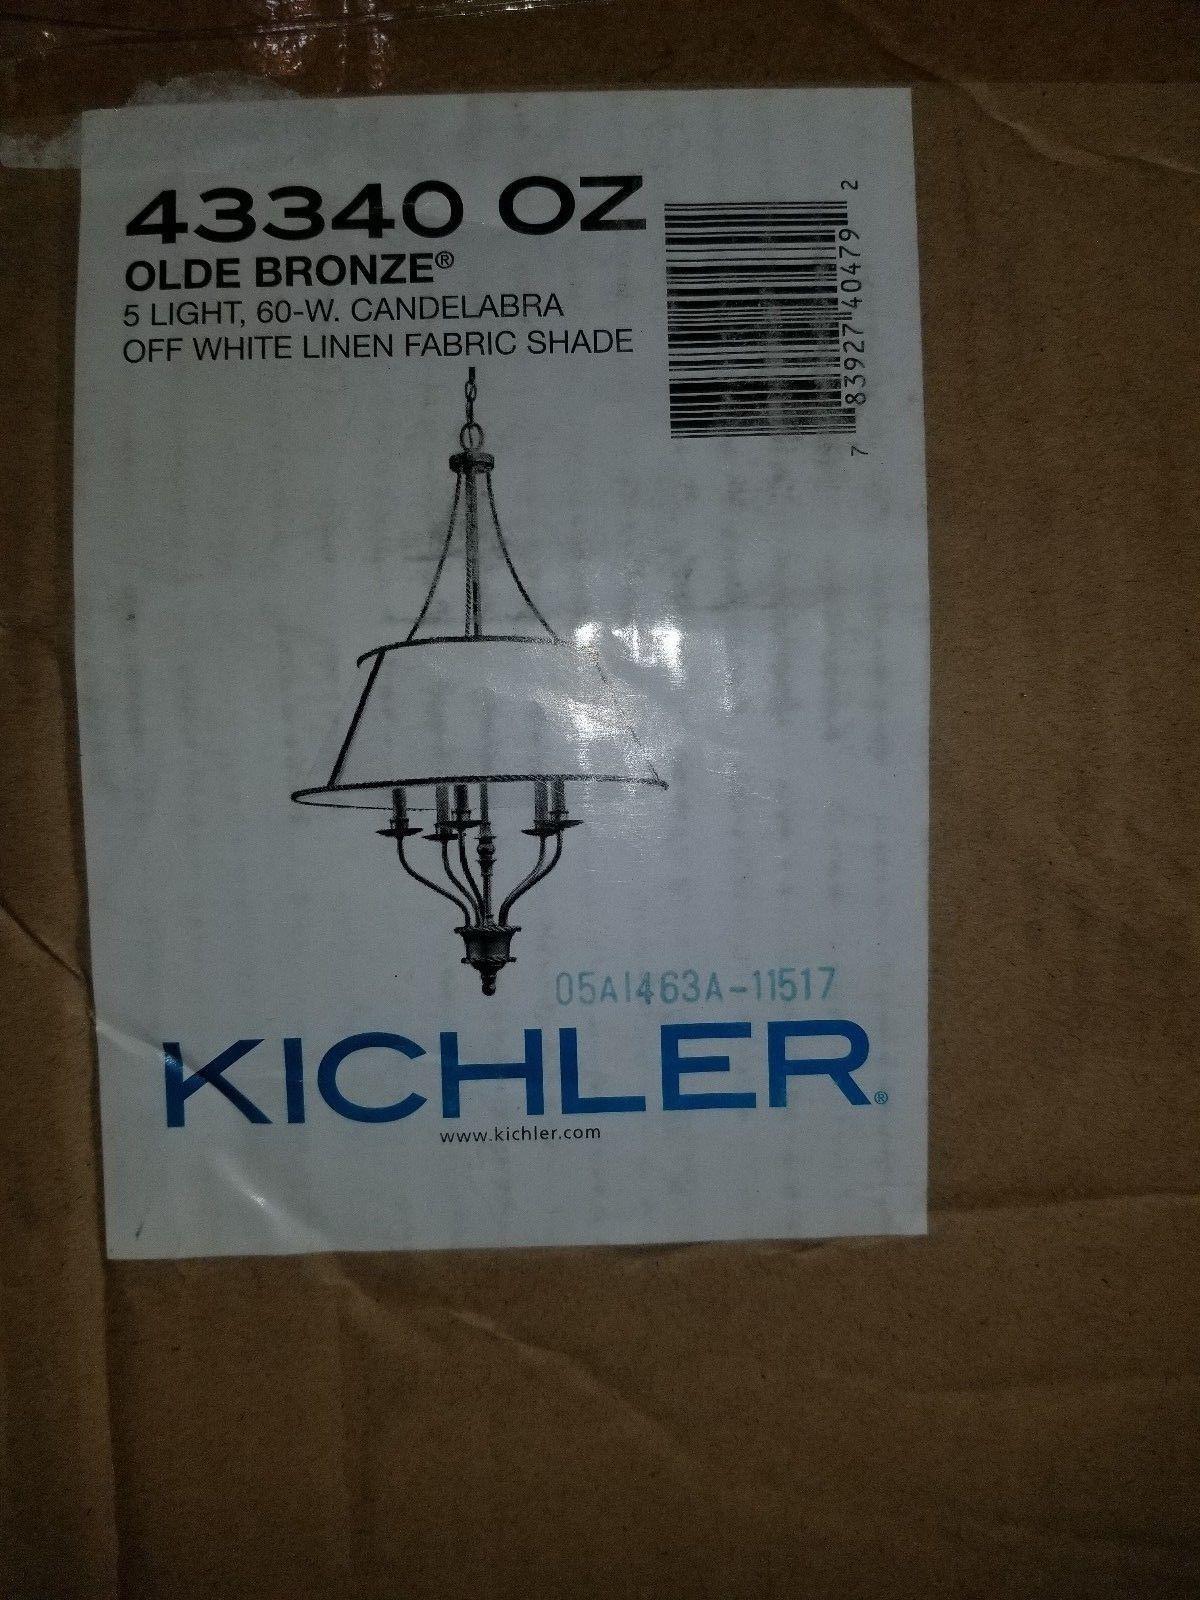 Kichler Lighting Donington 5 Light Chandelier in Olde Bronze 43340OZ - $287.10